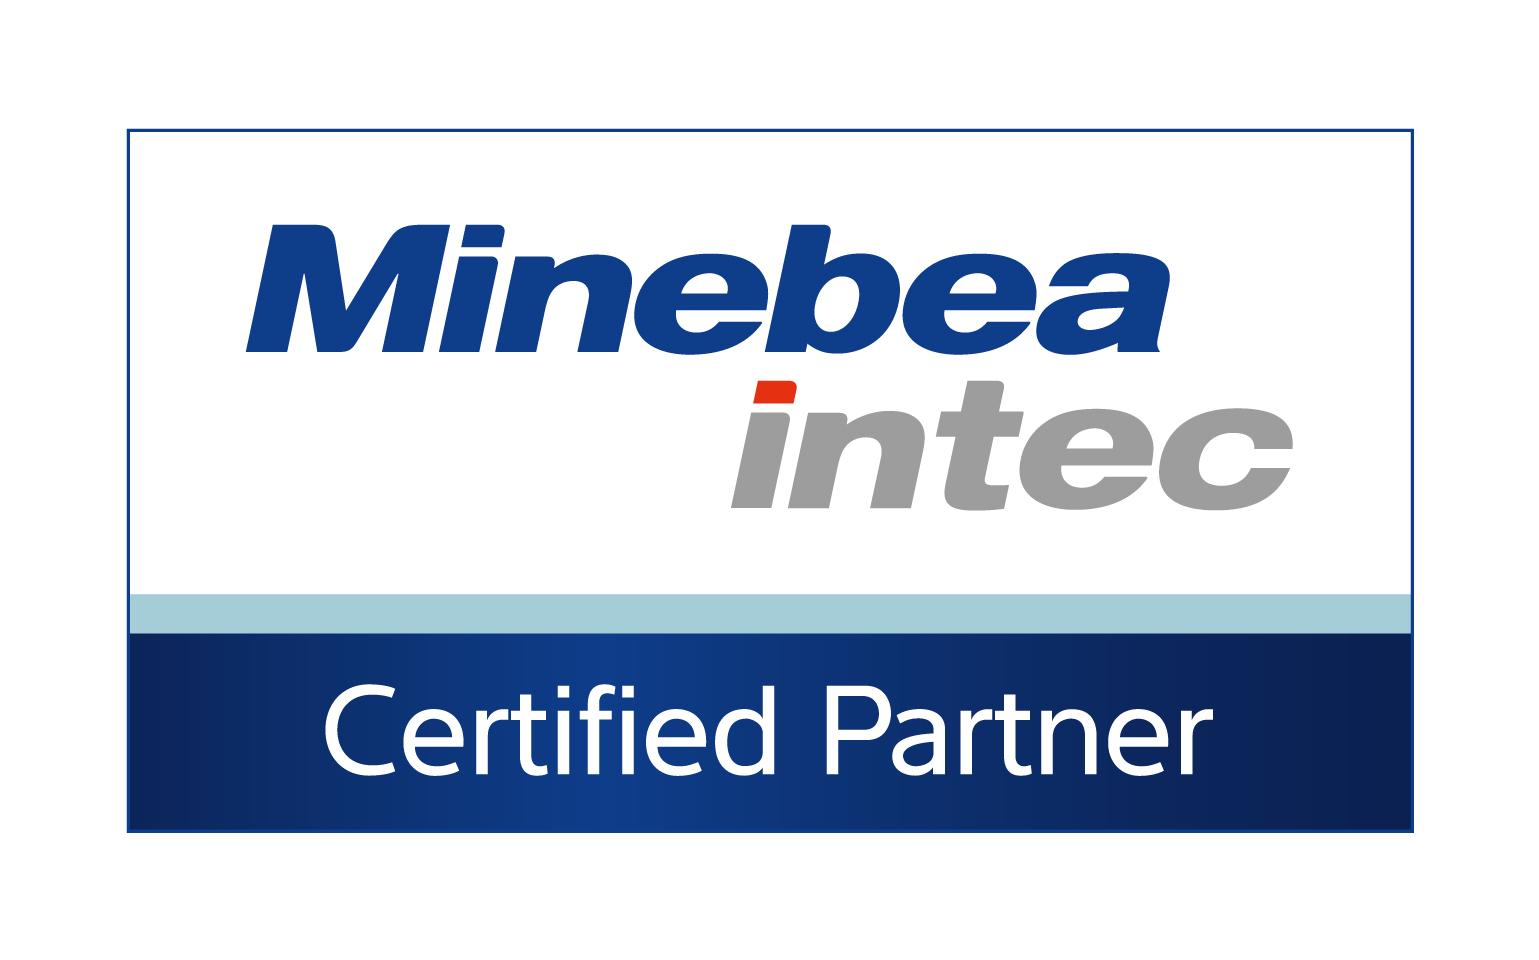 Minebea_Intec_Logo